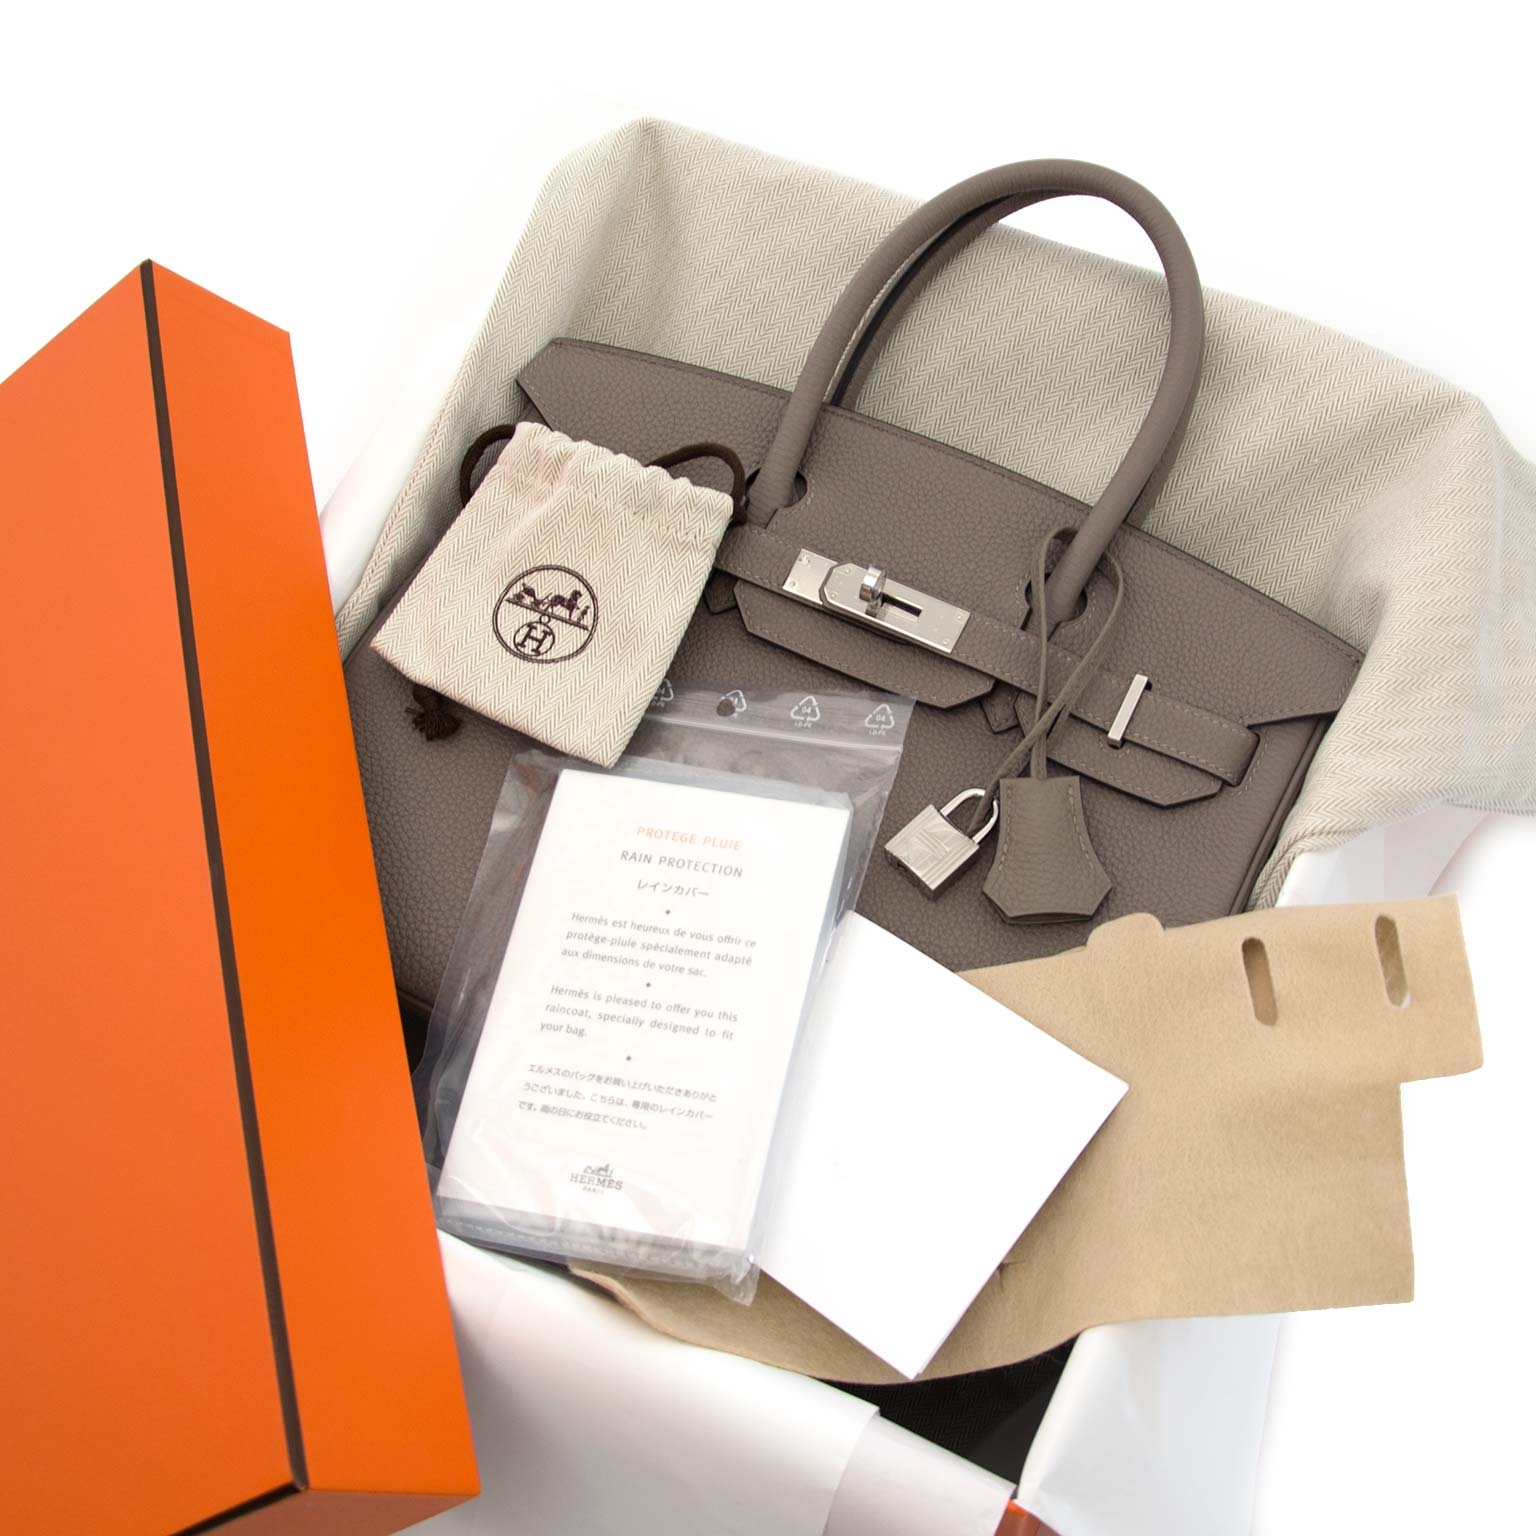 acheter en ligne chez labellov.com Hermès Birkin 30 Togo Gris Asphalte phw